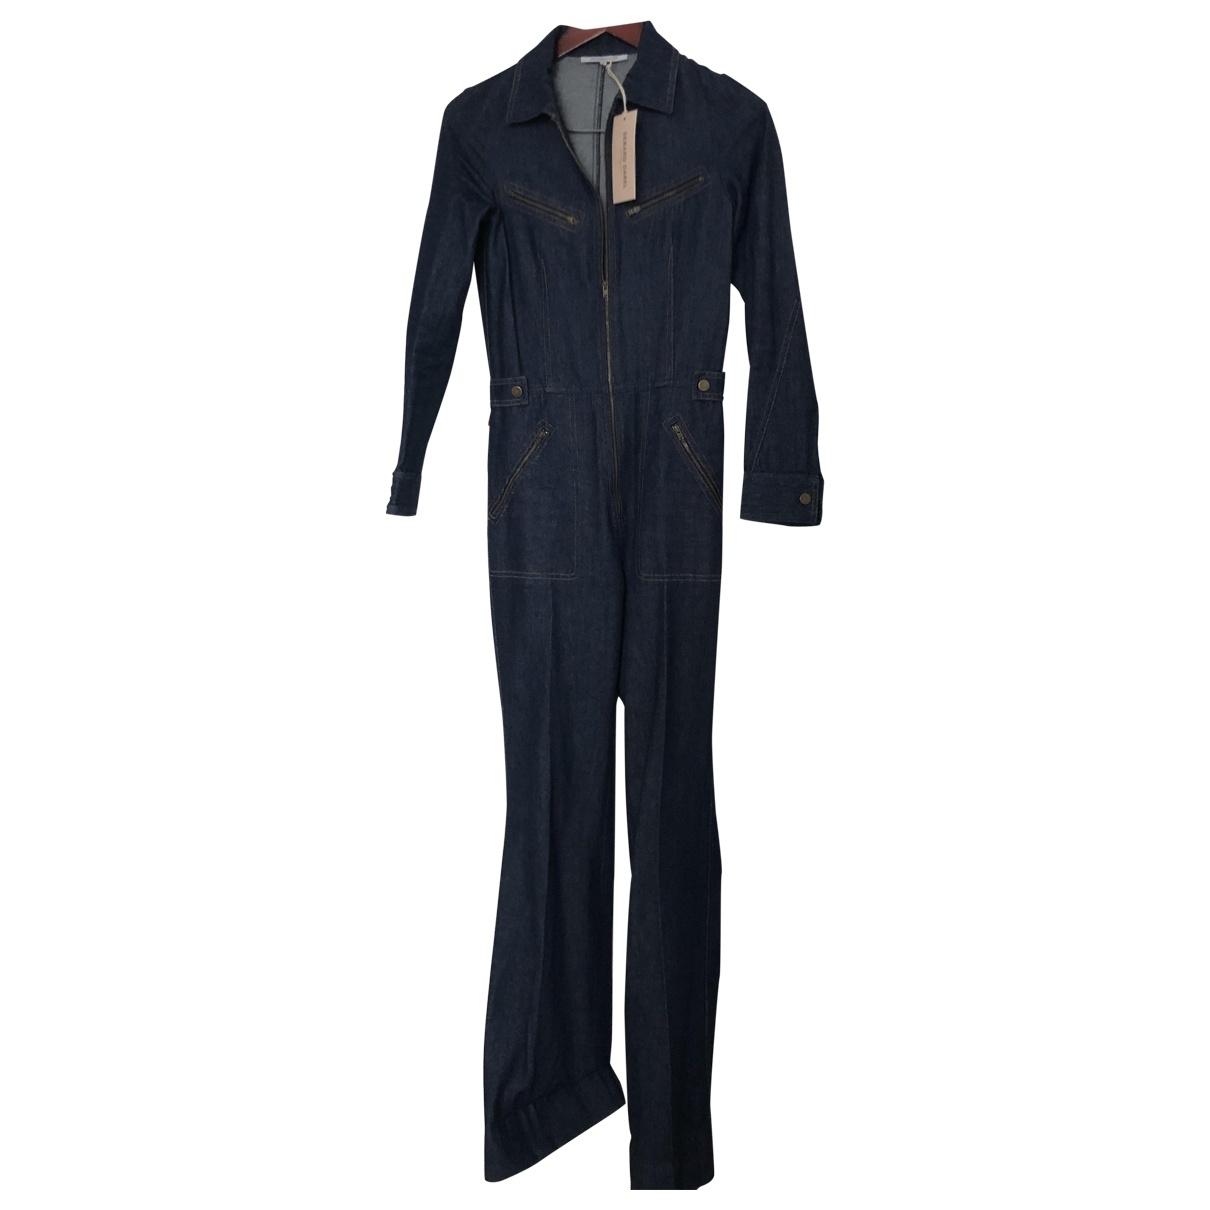 Gerard Darel \N Navy Denim - Jeans jumpsuit for Women 34 FR